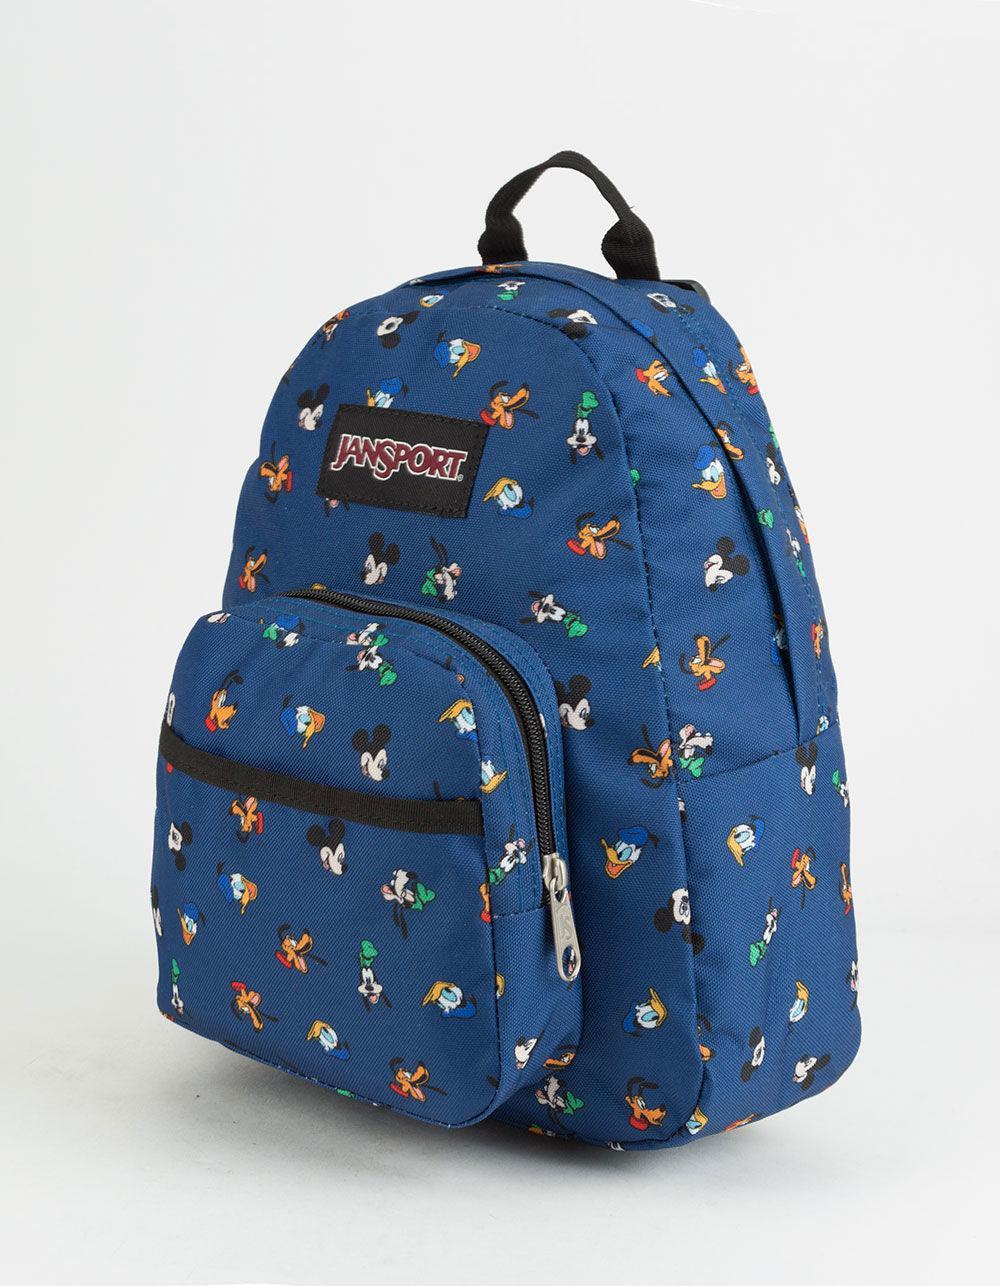 136c5f42eec Mini Jansport Backpack Disney- Fenix Toulouse Handball